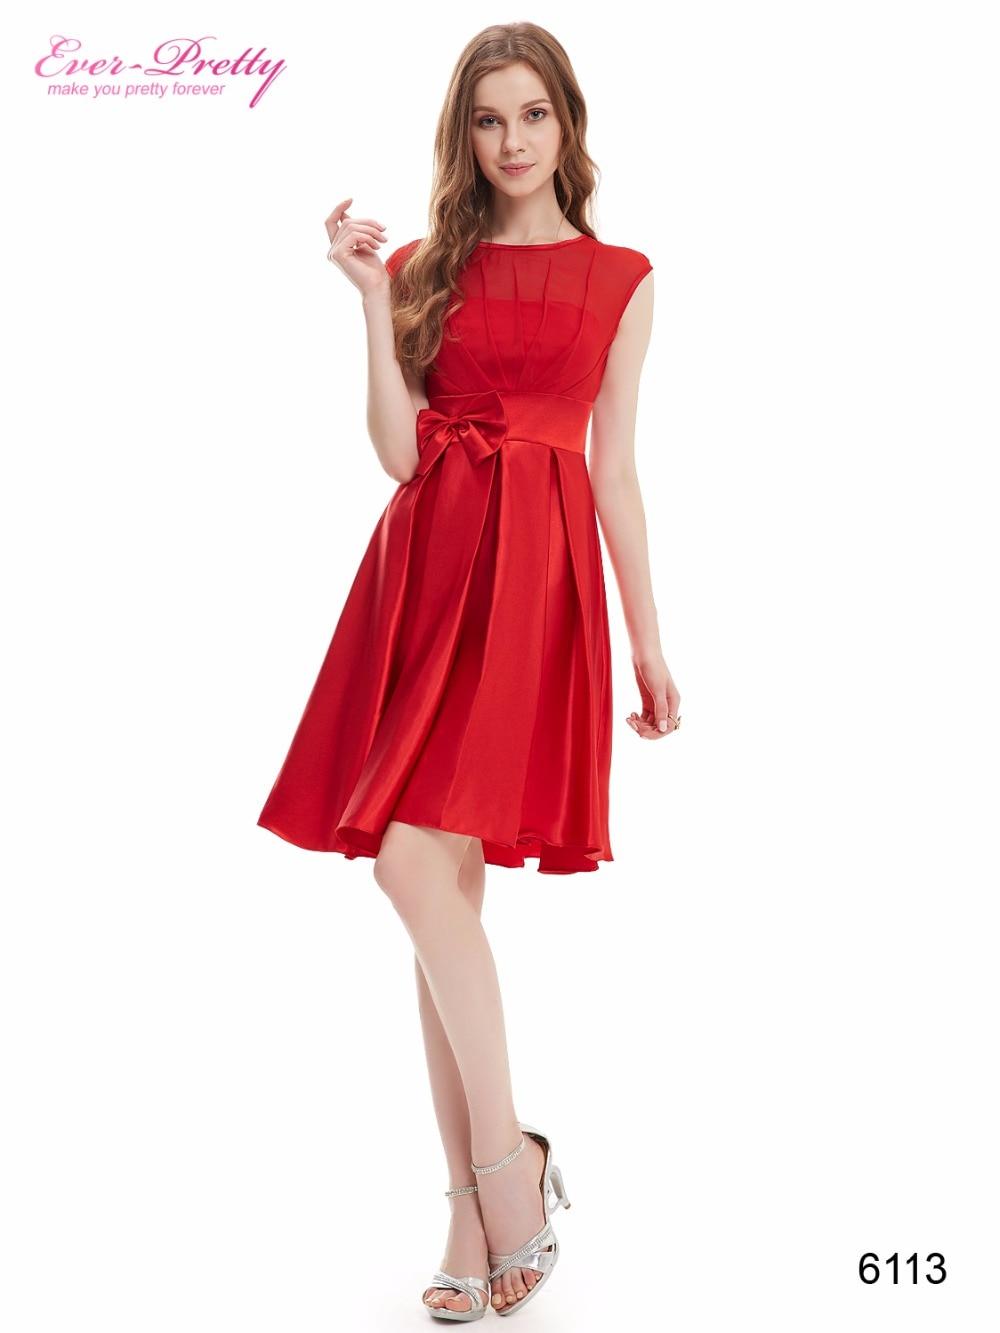 [Clearance Sale] Elegant Cocktail Dresses Ever Pre...